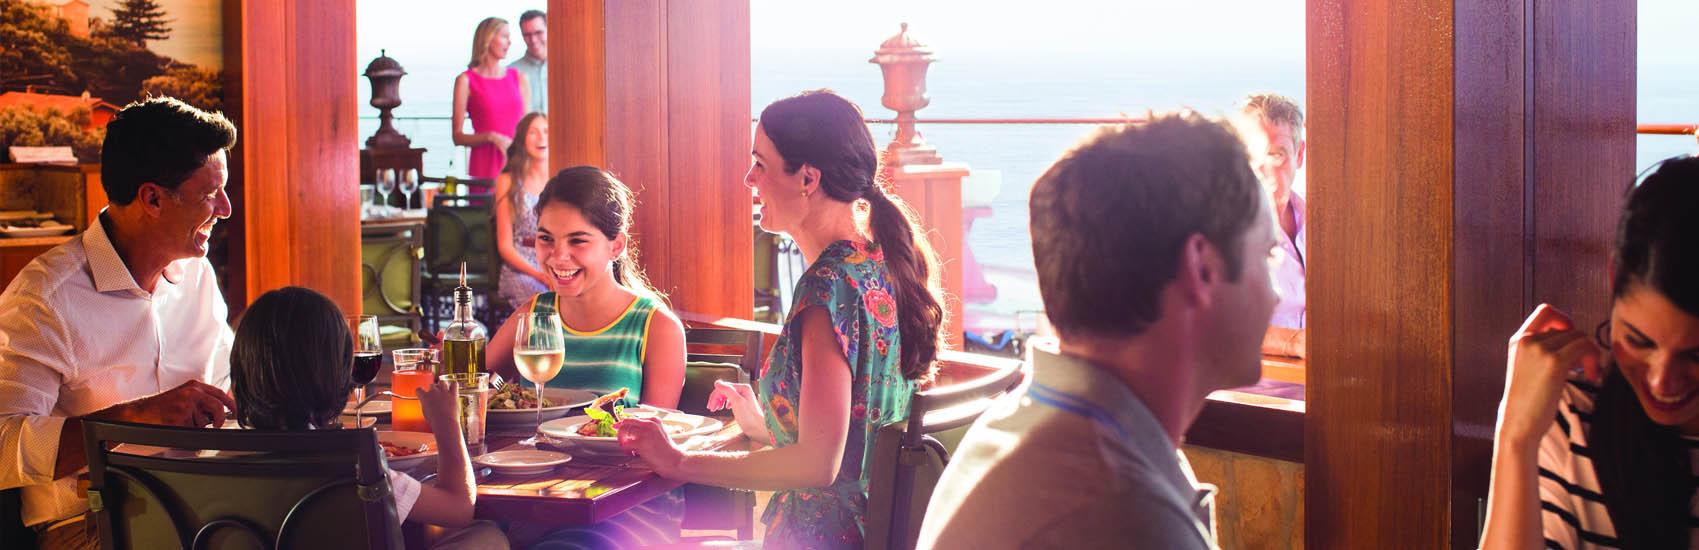 Norwegian Cruise Line's Free at Sea 5